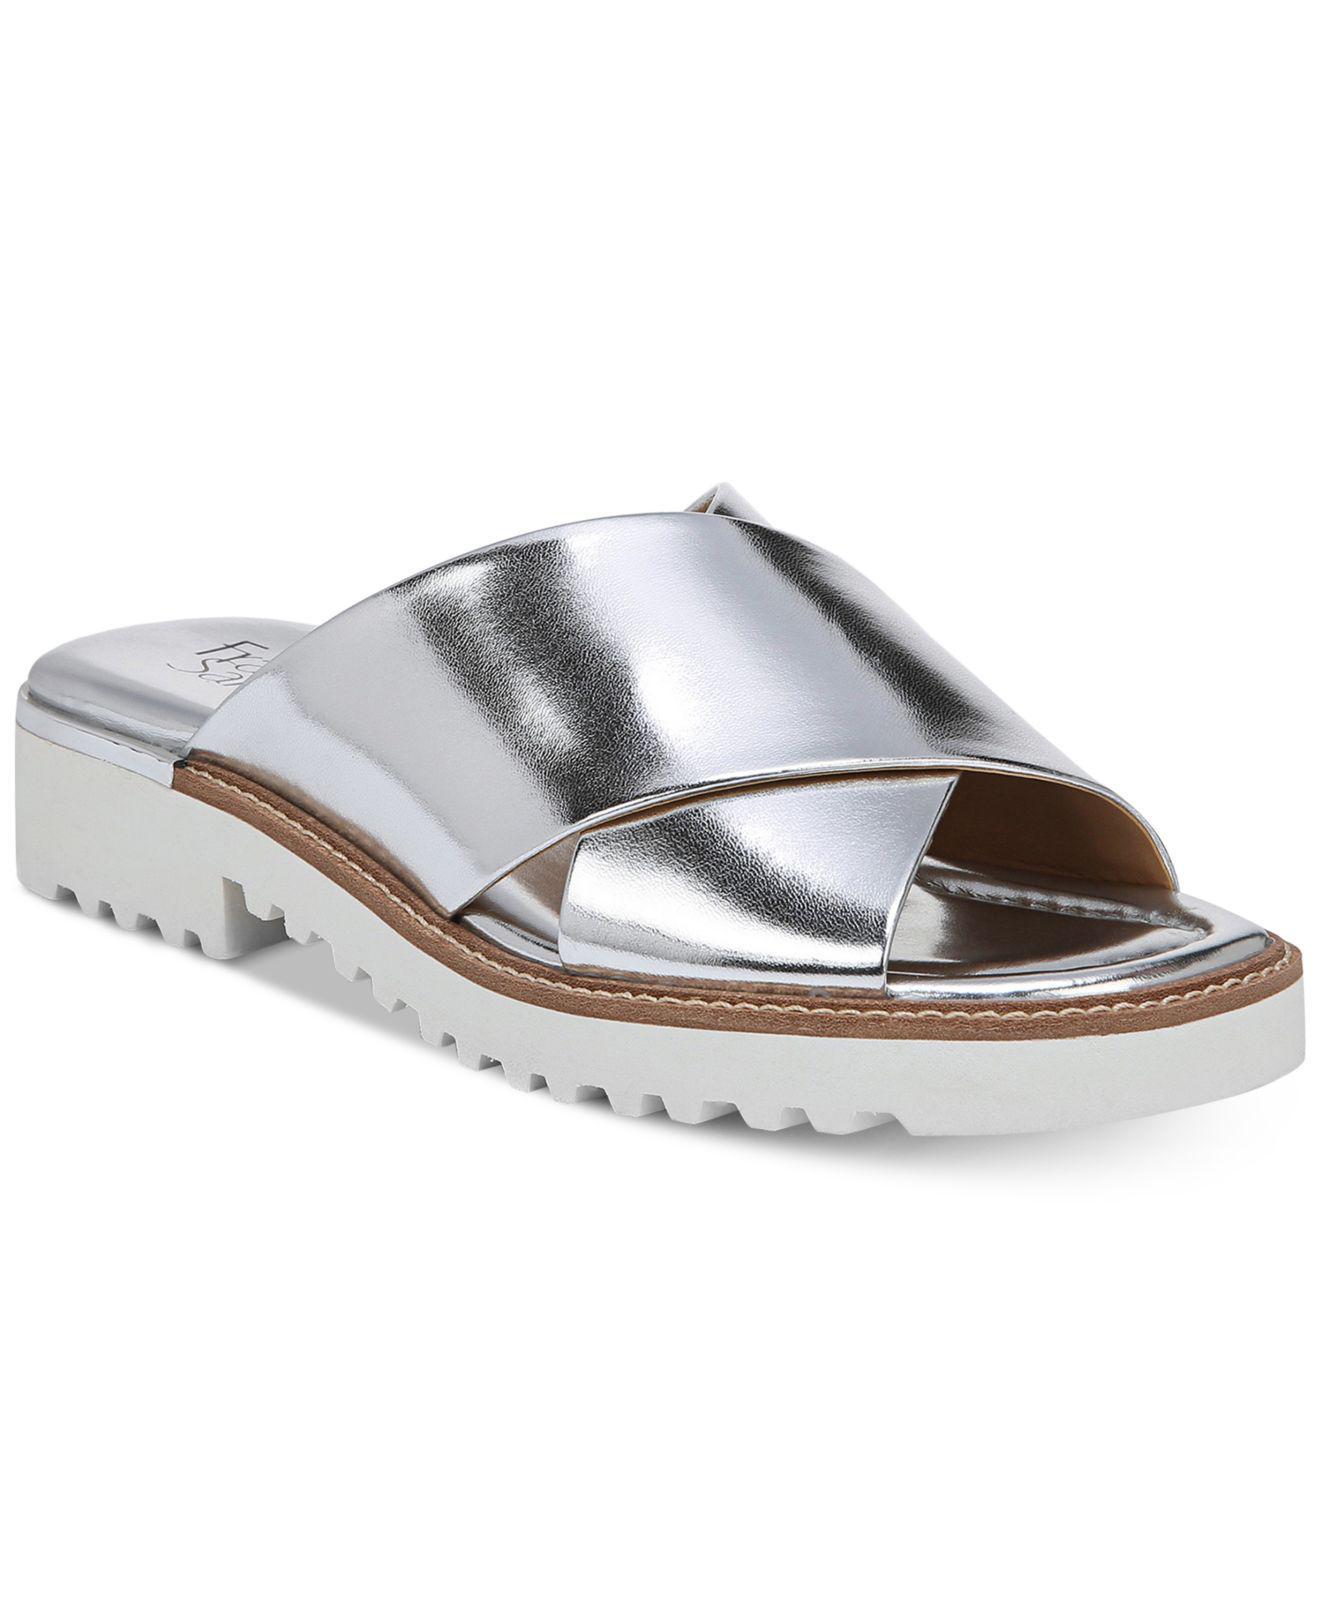 Franco Sarto Tilden Leather Slides 0lK2Bc6MY1